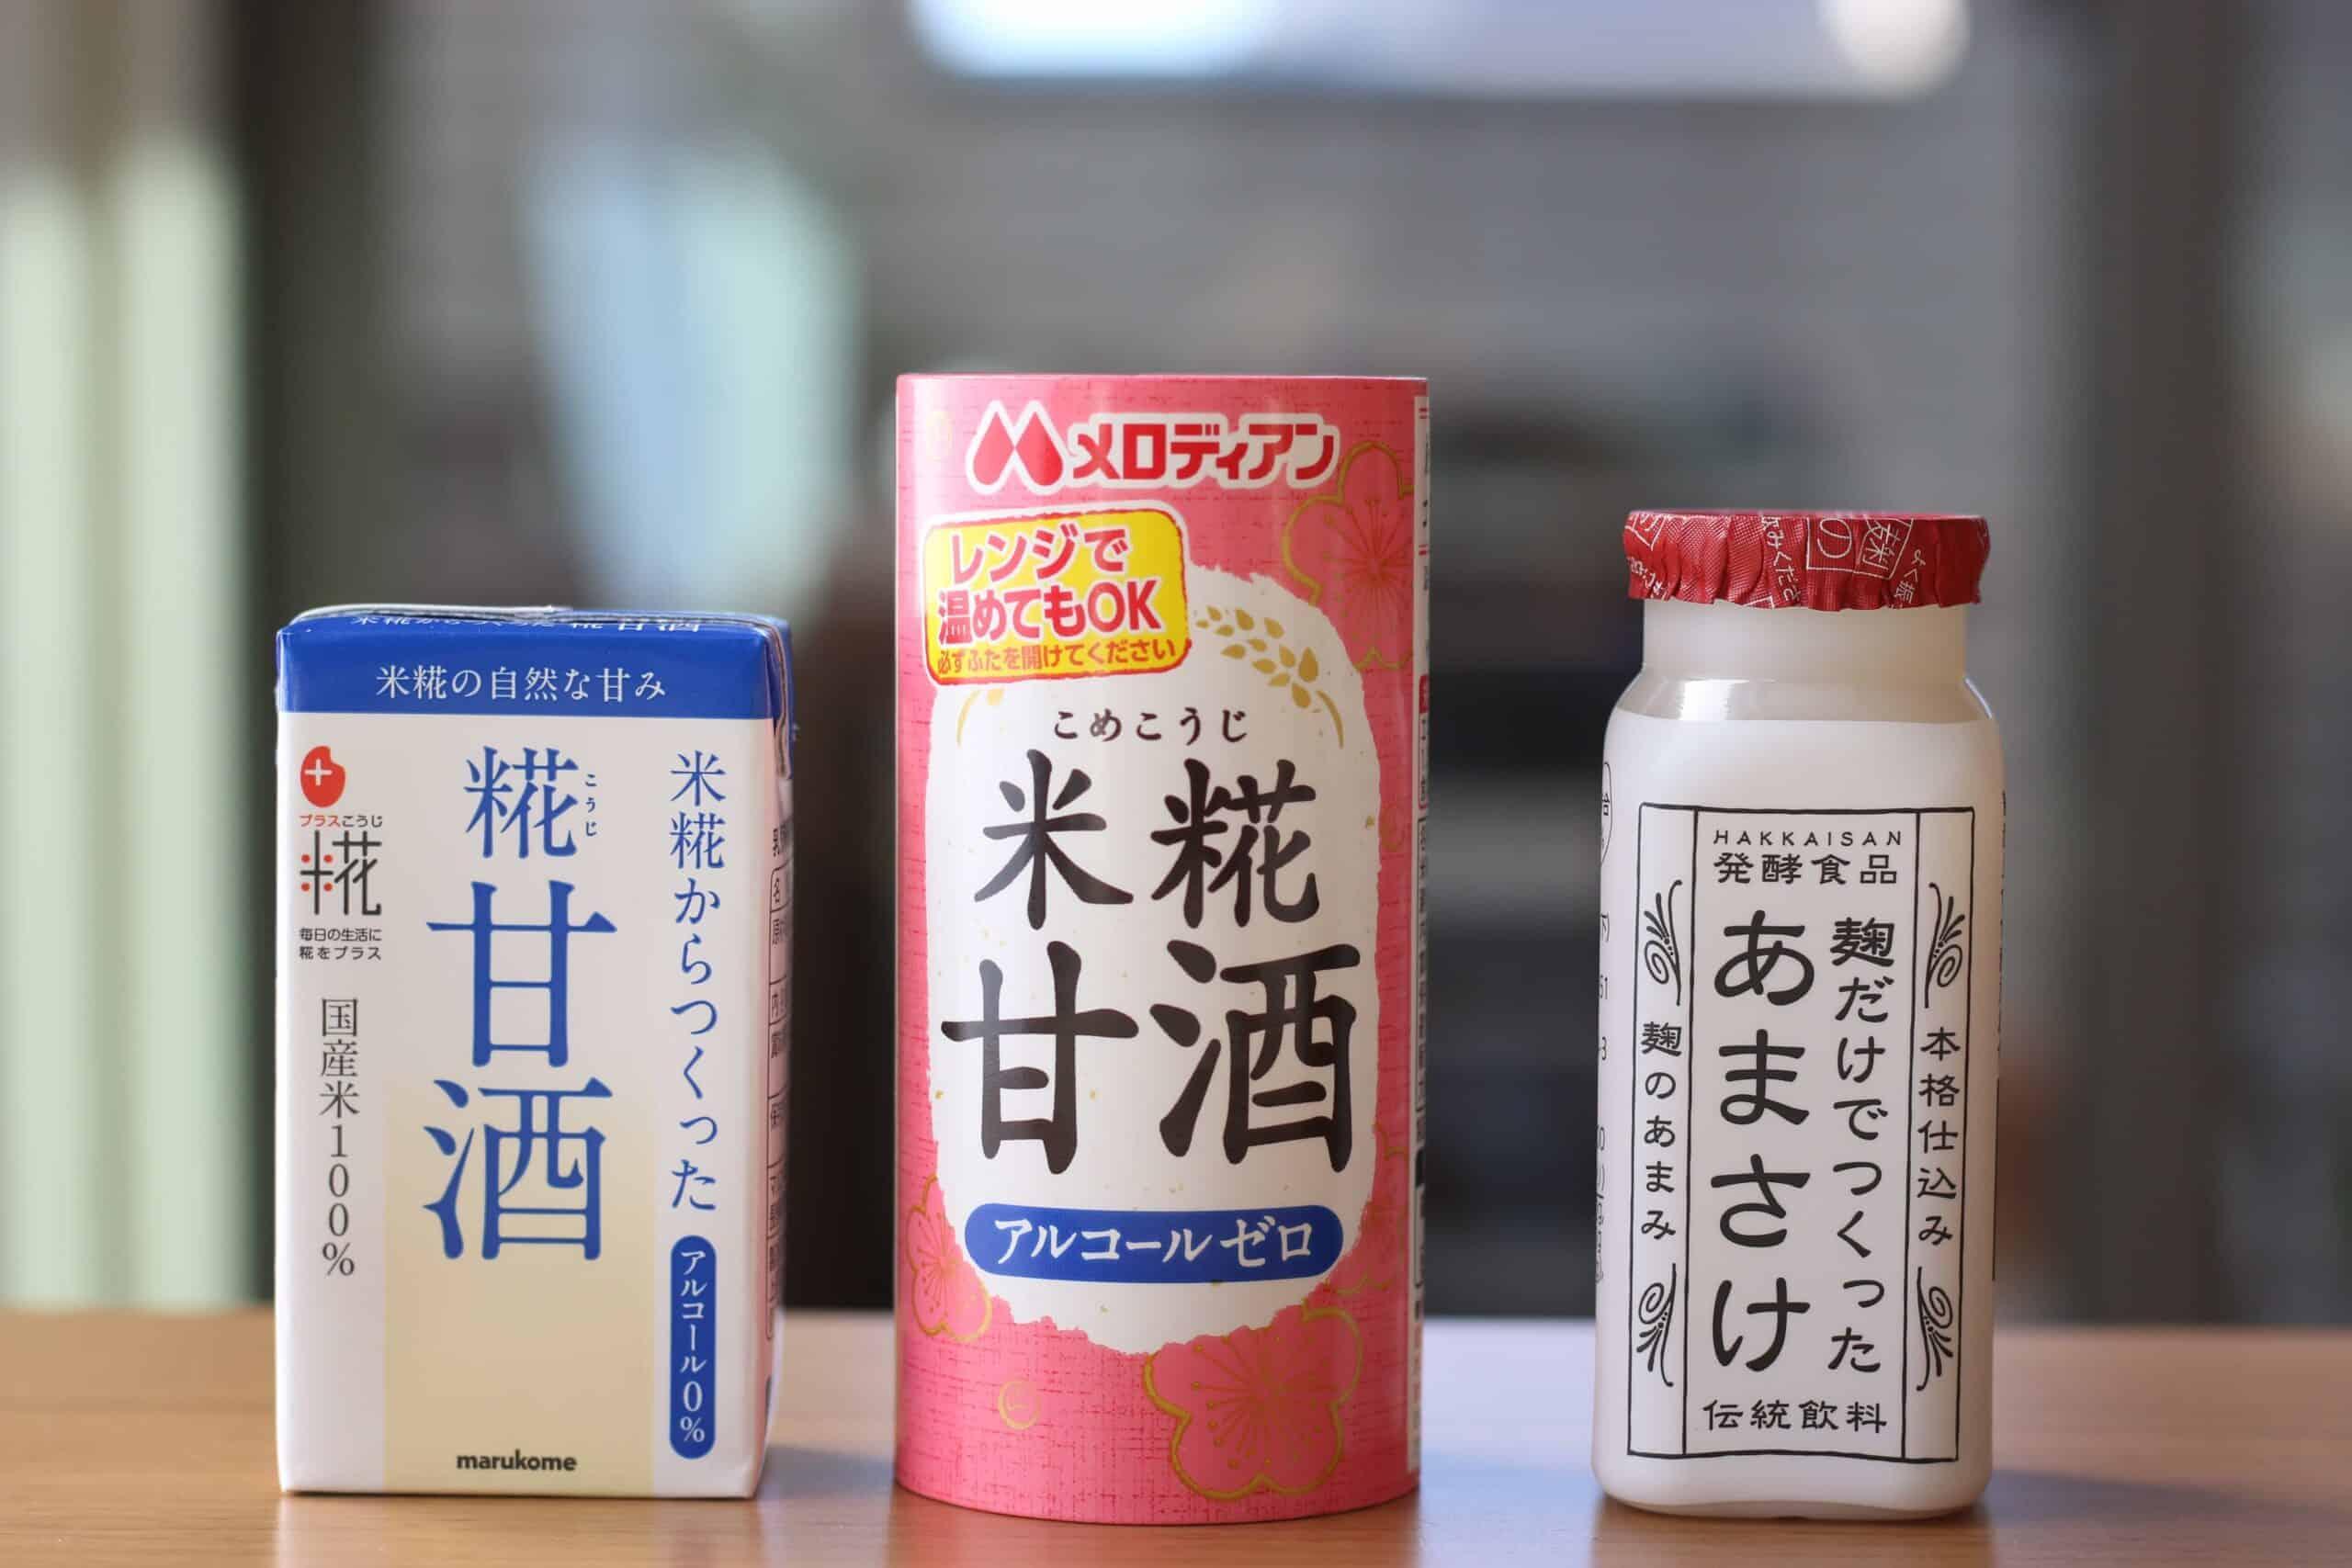 3 different rice koji Amazake